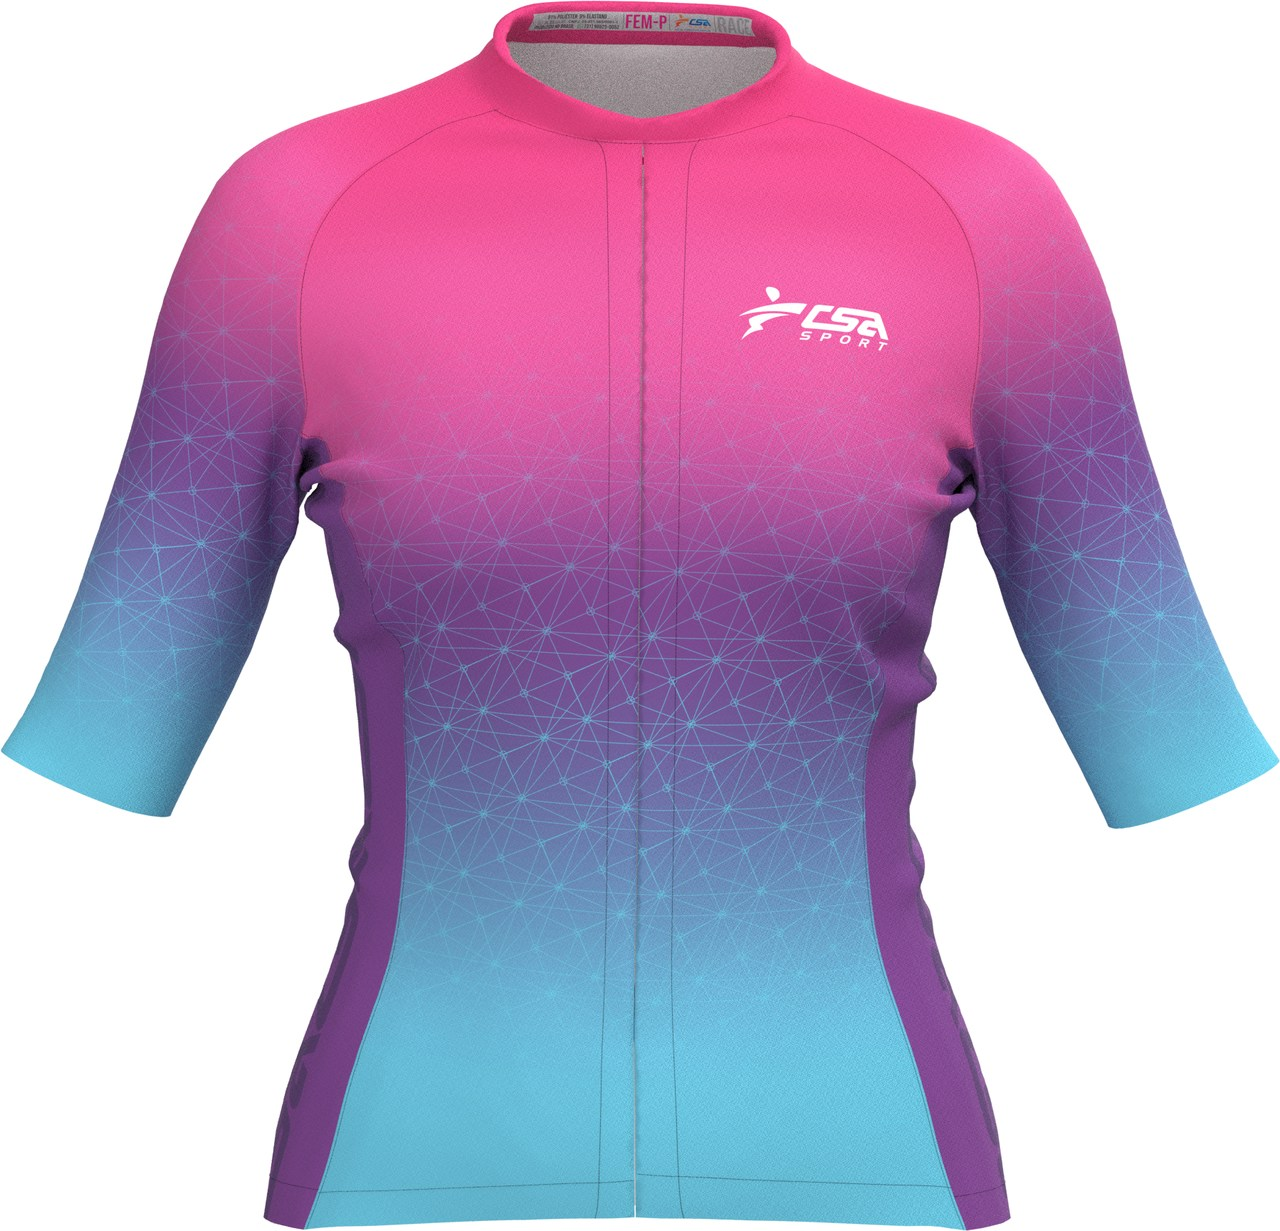 Camisa Ciclista Fast CSA Sport Feminina Twilight